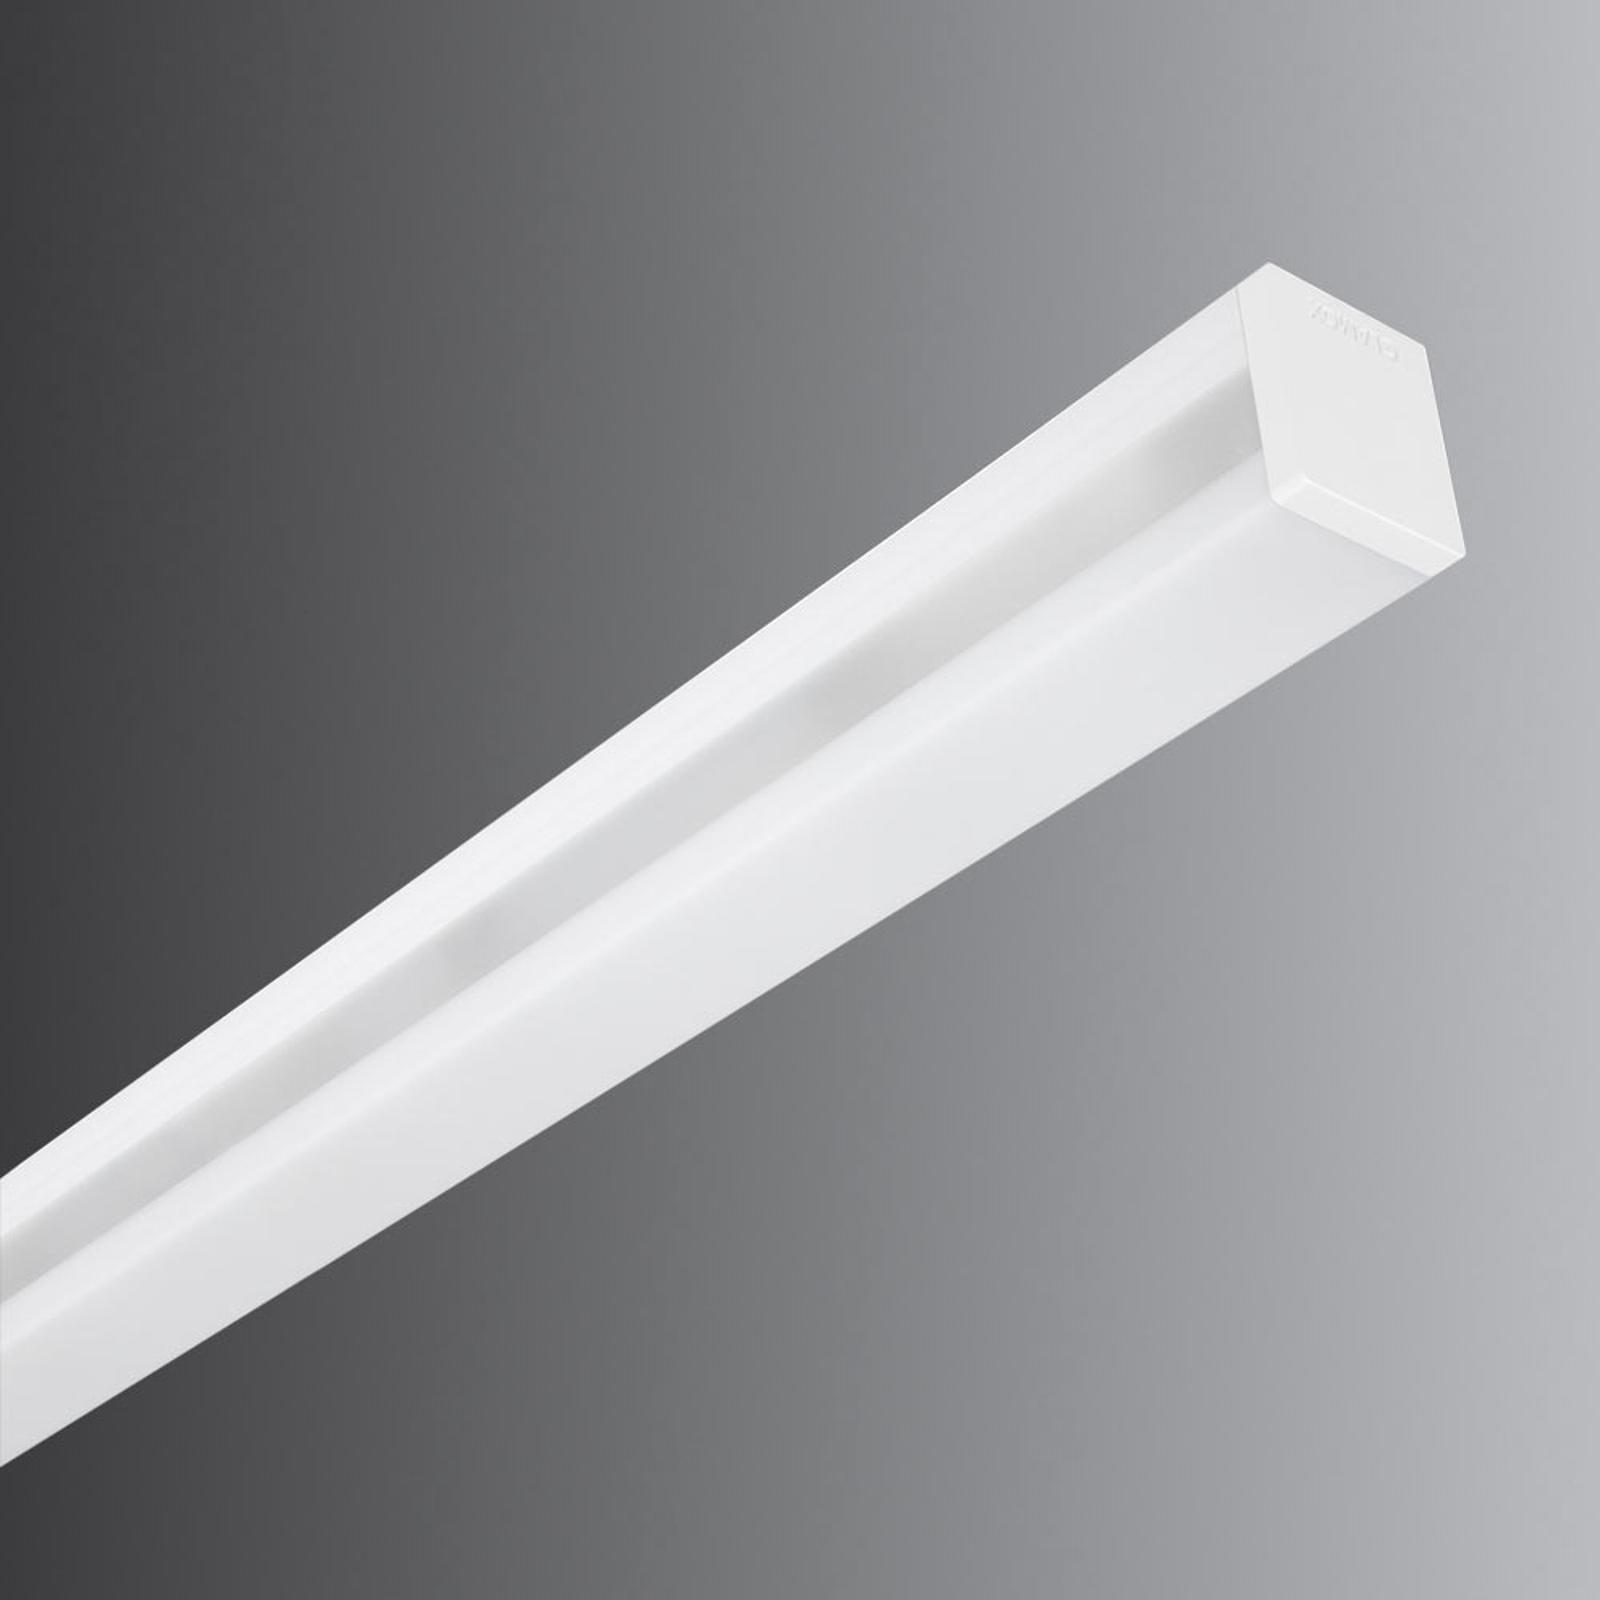 16 W LED-peililamppu A40-W1200 2100HF 120cm 3 000